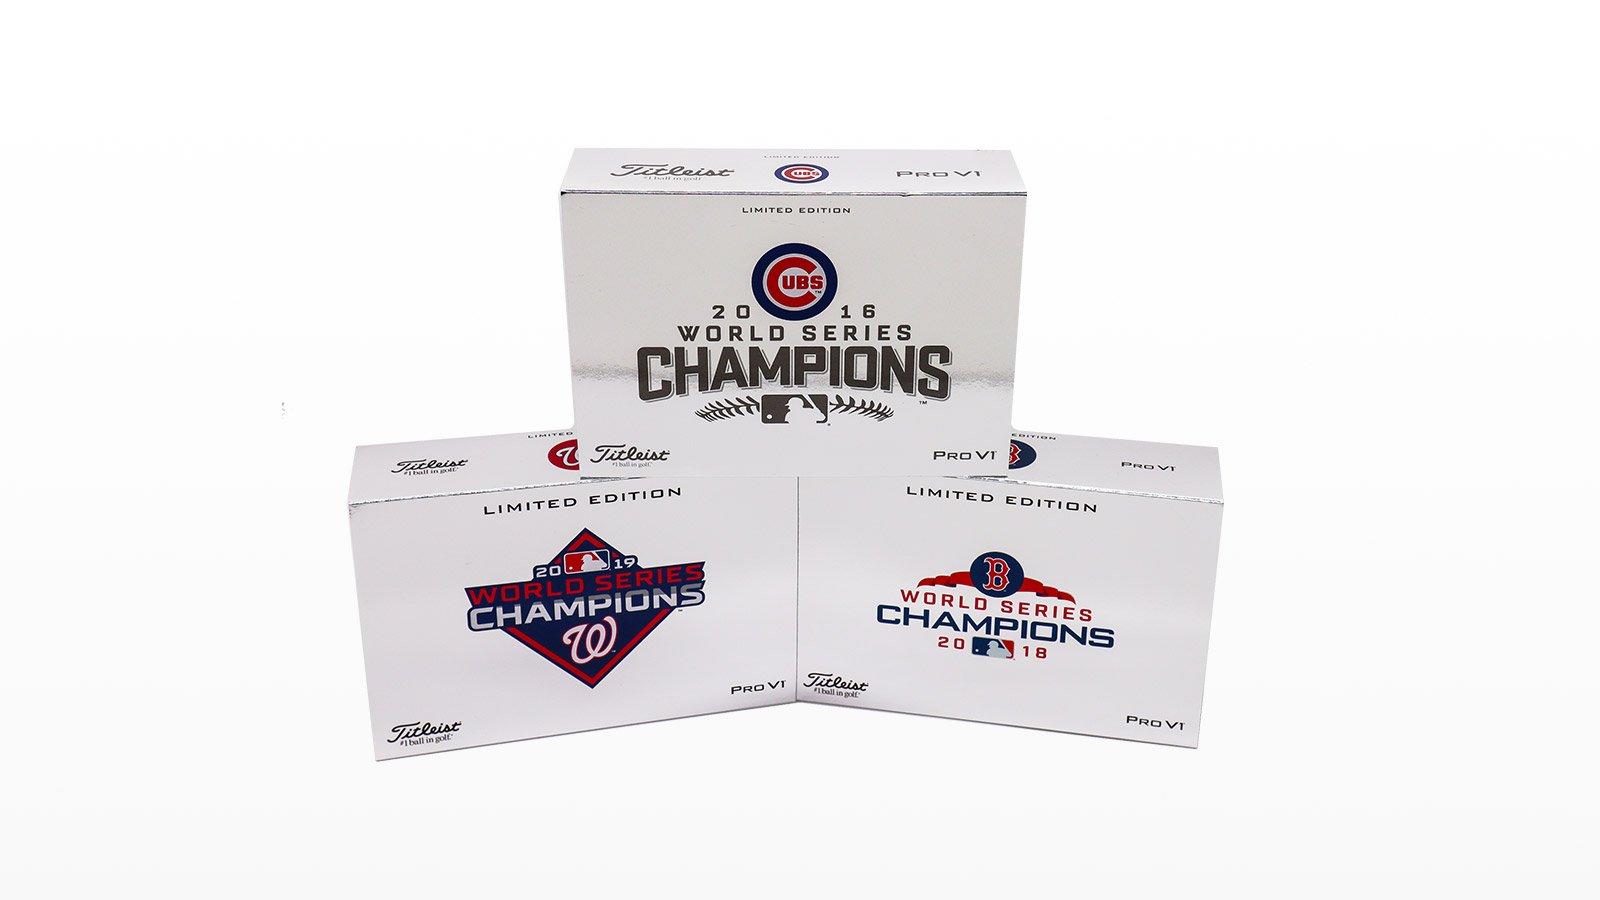 world series packaging